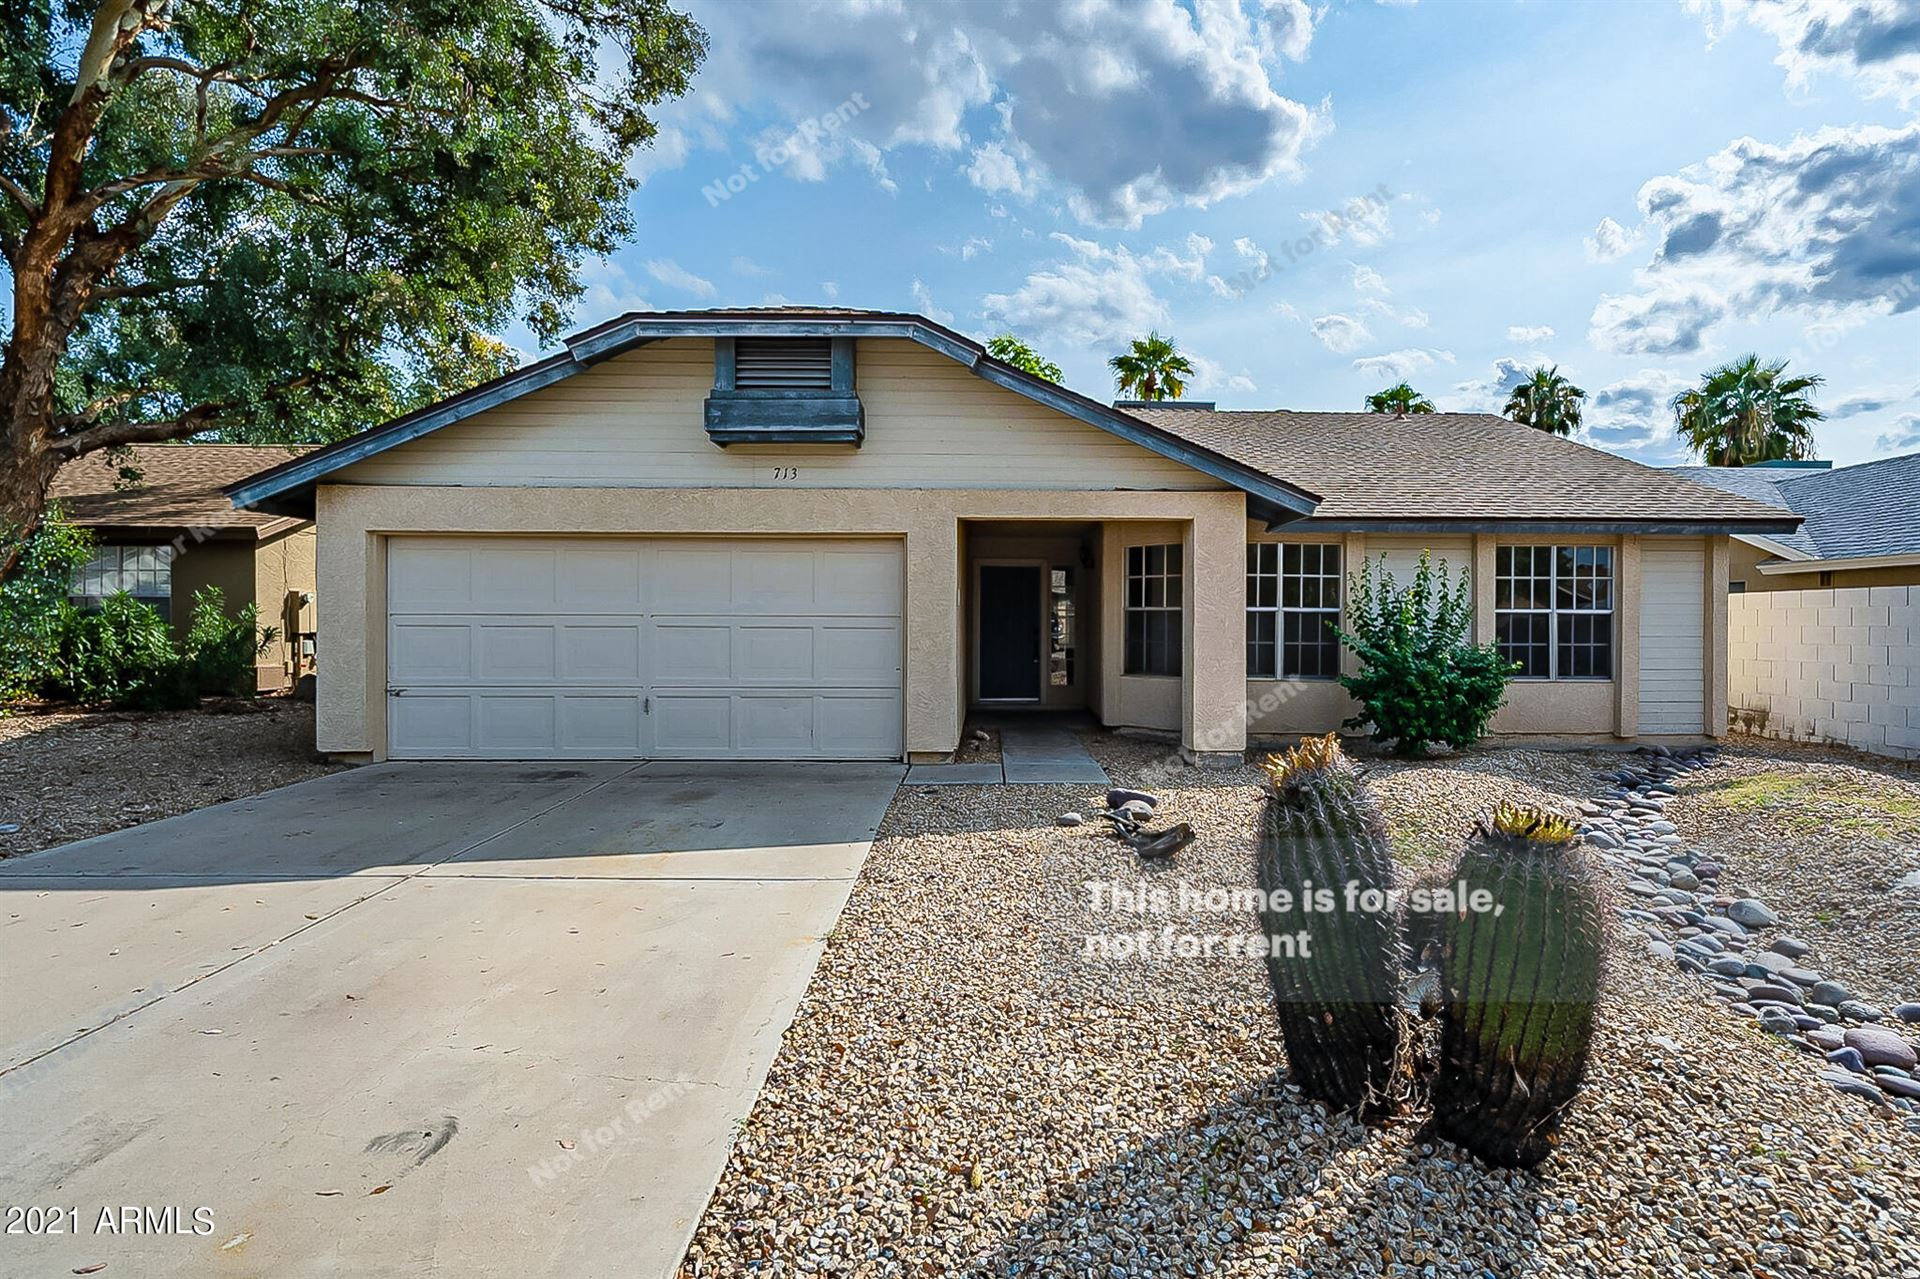 713 W SEQUOIA Drive, Phoenix, AZ 85027 - MLS#: 6301688